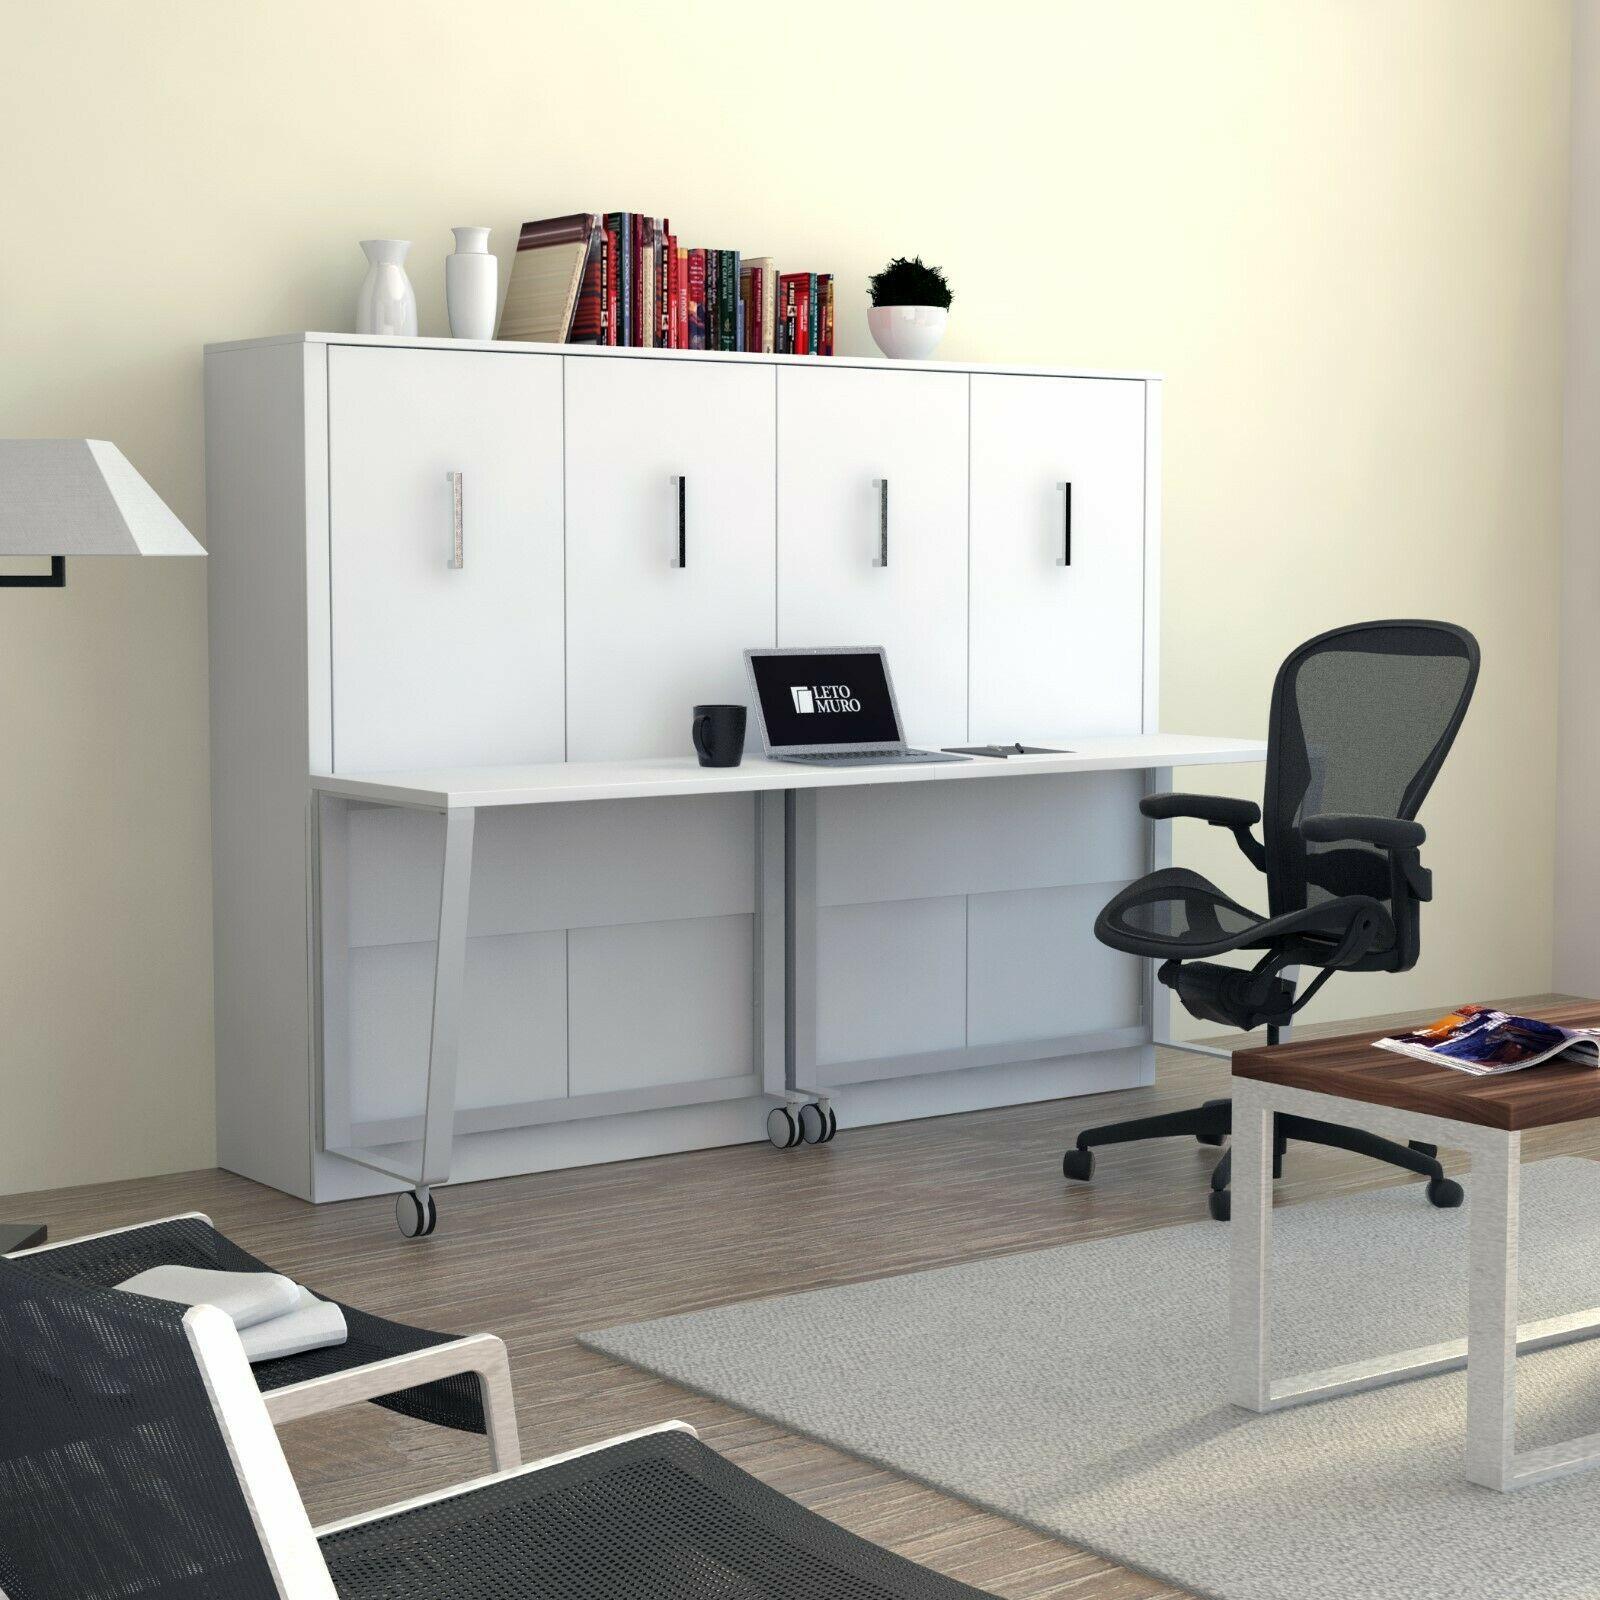 "URBAN LOFT ""ALEXA"" Full Wall Murphy Bed with Desk"